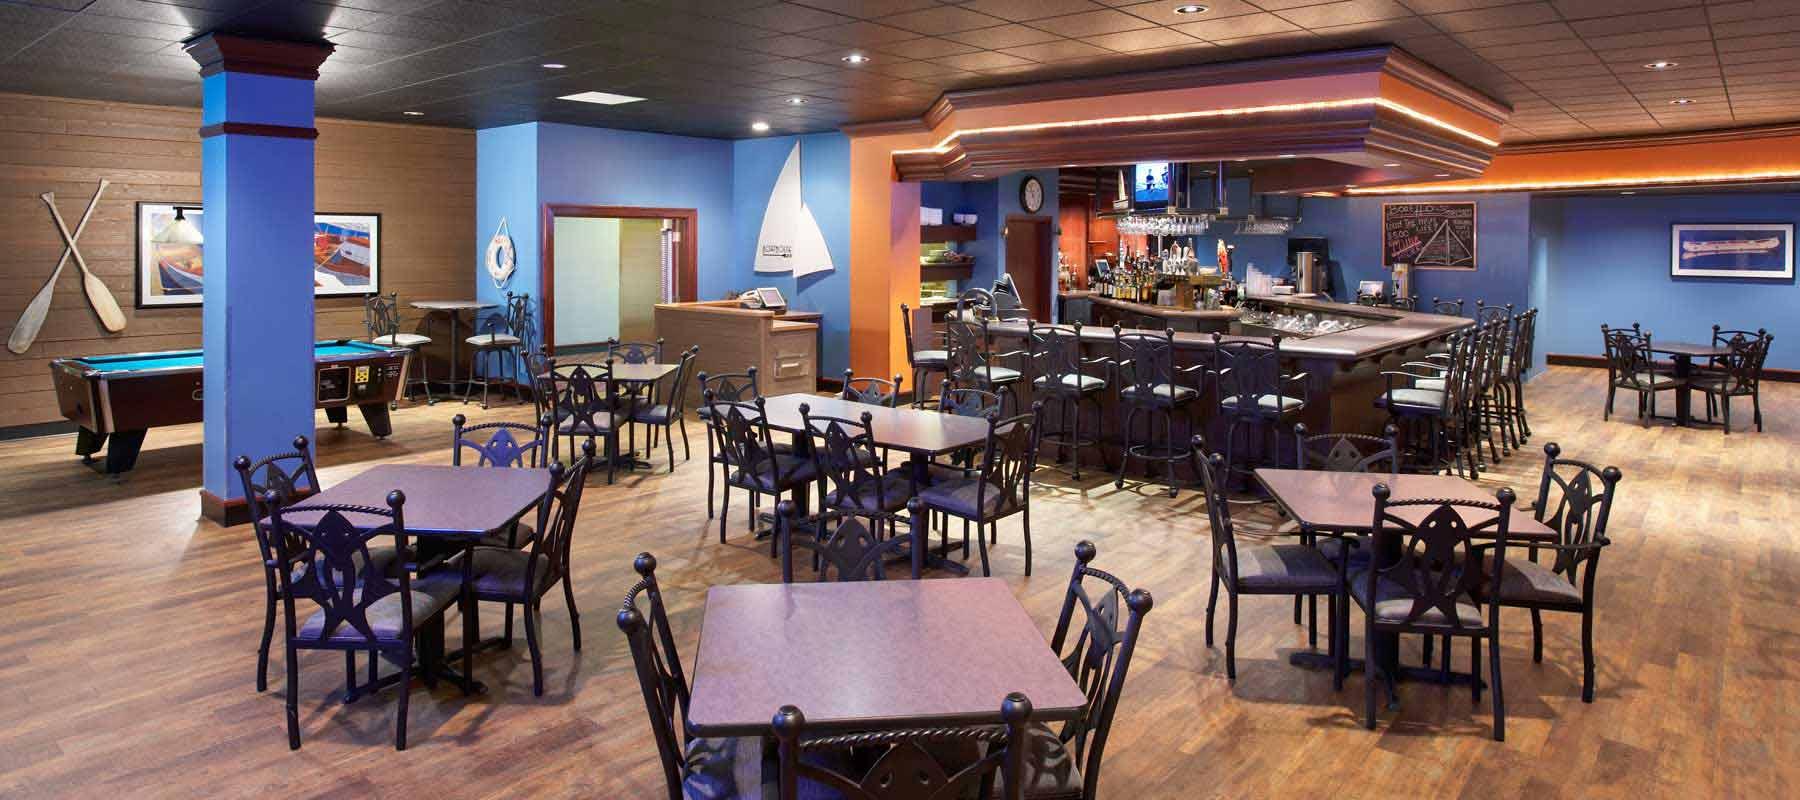 BoatHouse Pub - Dining Room